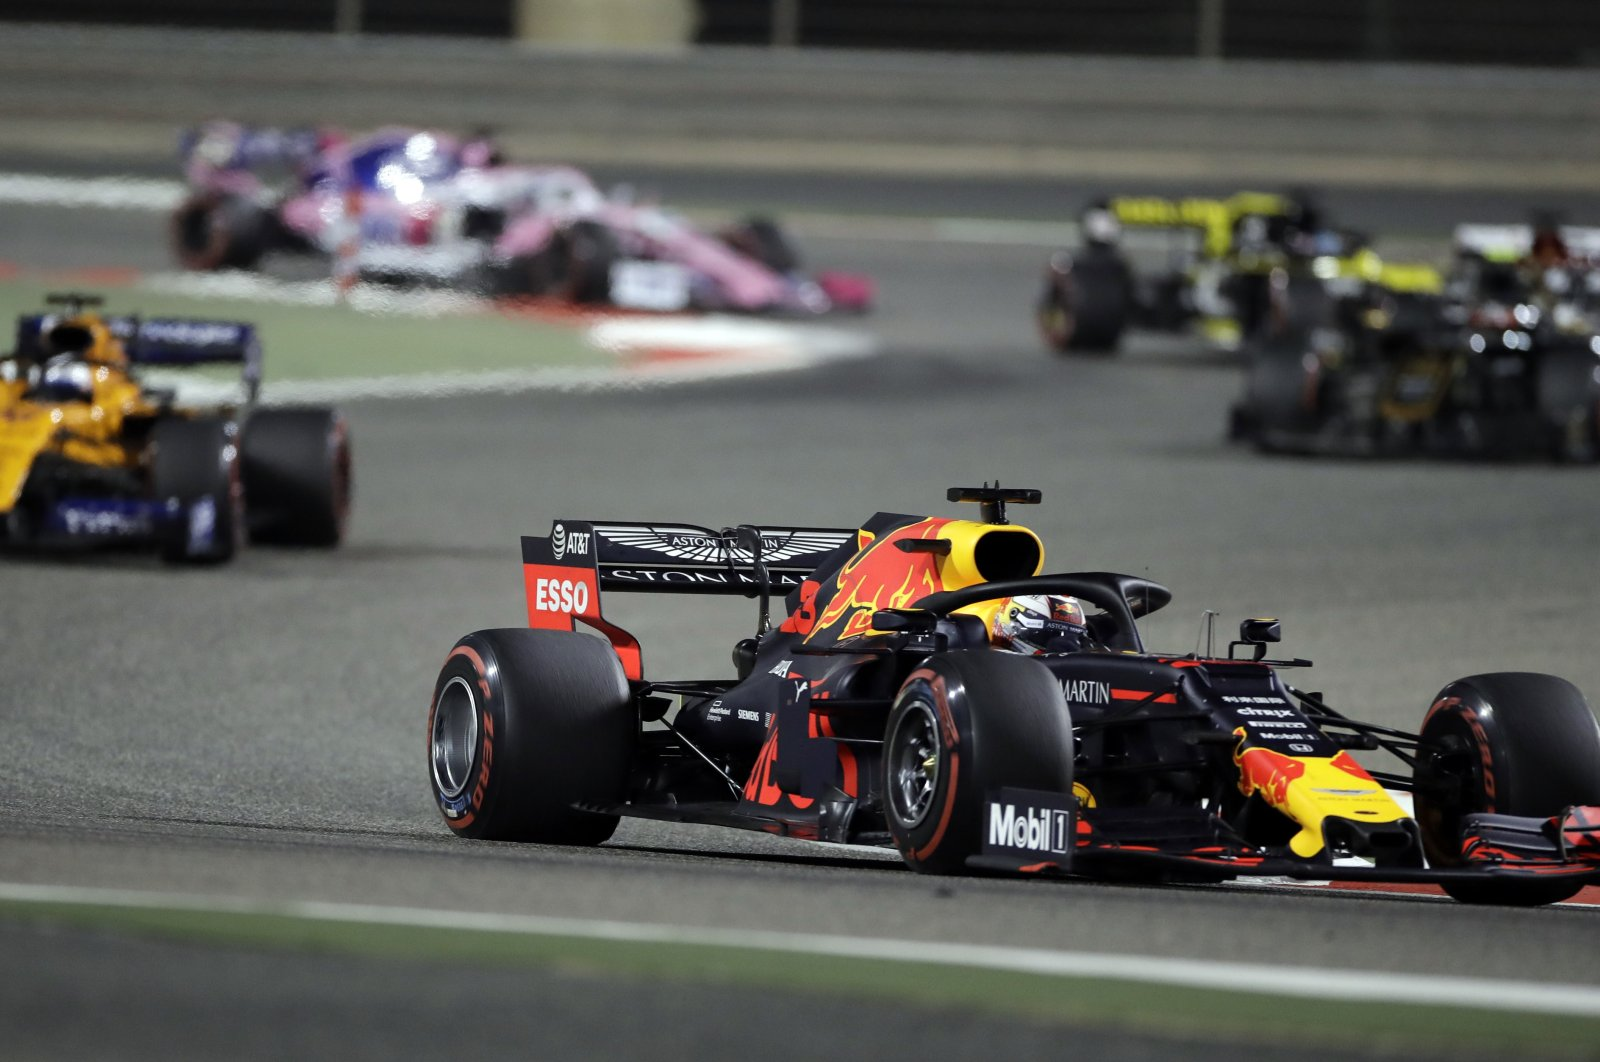 Red Bull driver Max Verstappen steers his car during the F1 Bahrain Grand Prix at the Bahrain International Circuit in Sakhir, Bahrain, March 31, 2019. (AP Photo)